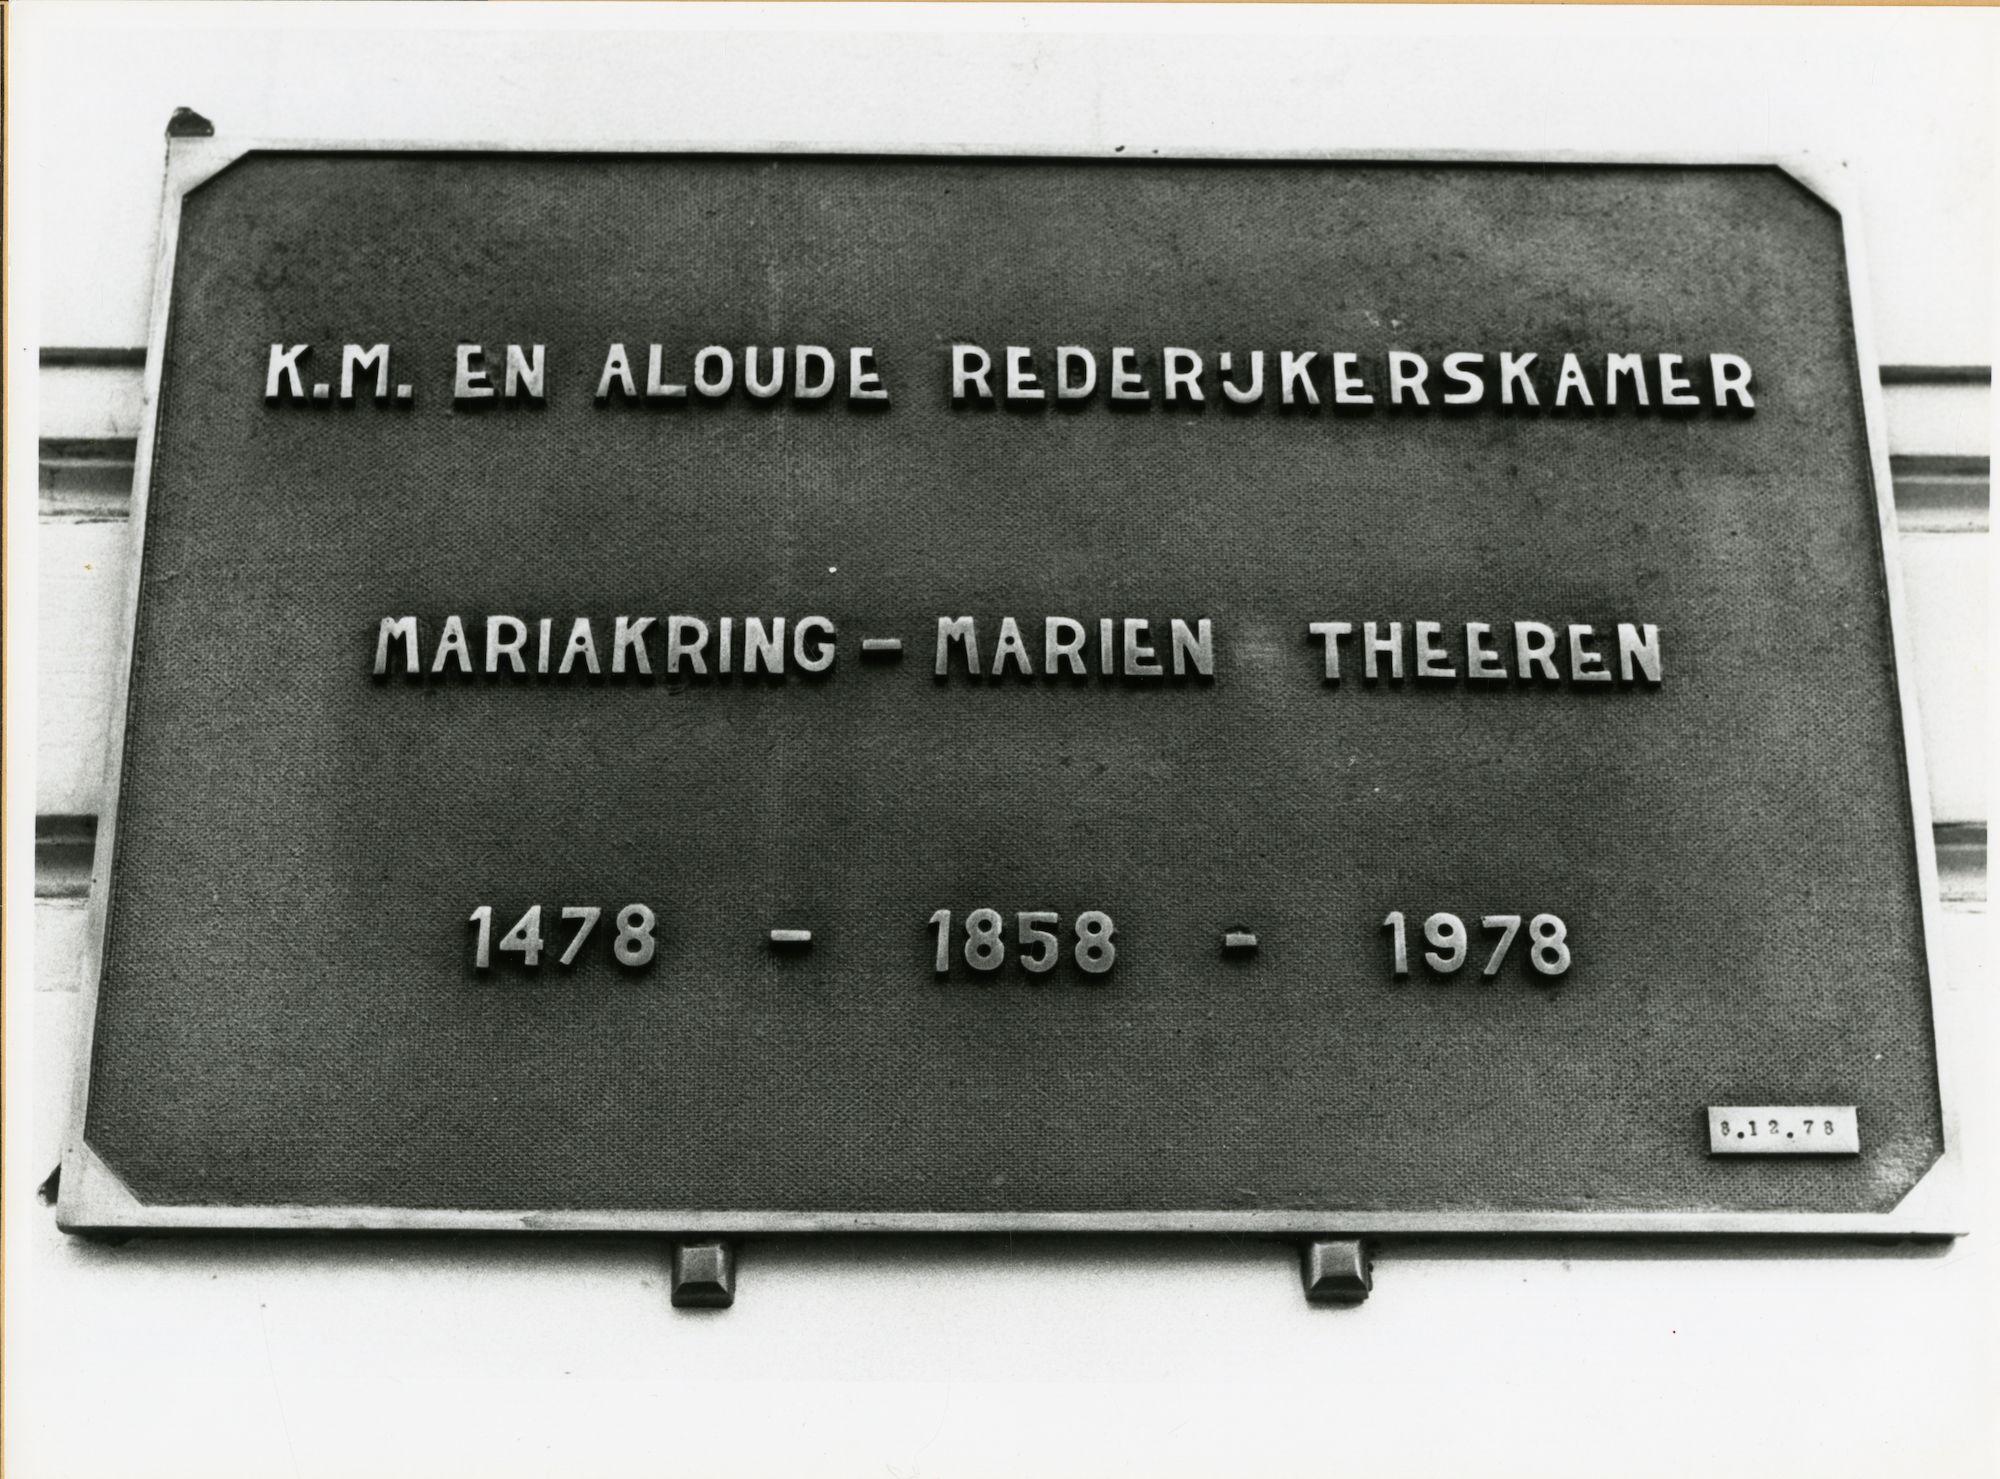 Gent: Ingelandgat 19: Gedenkplaat